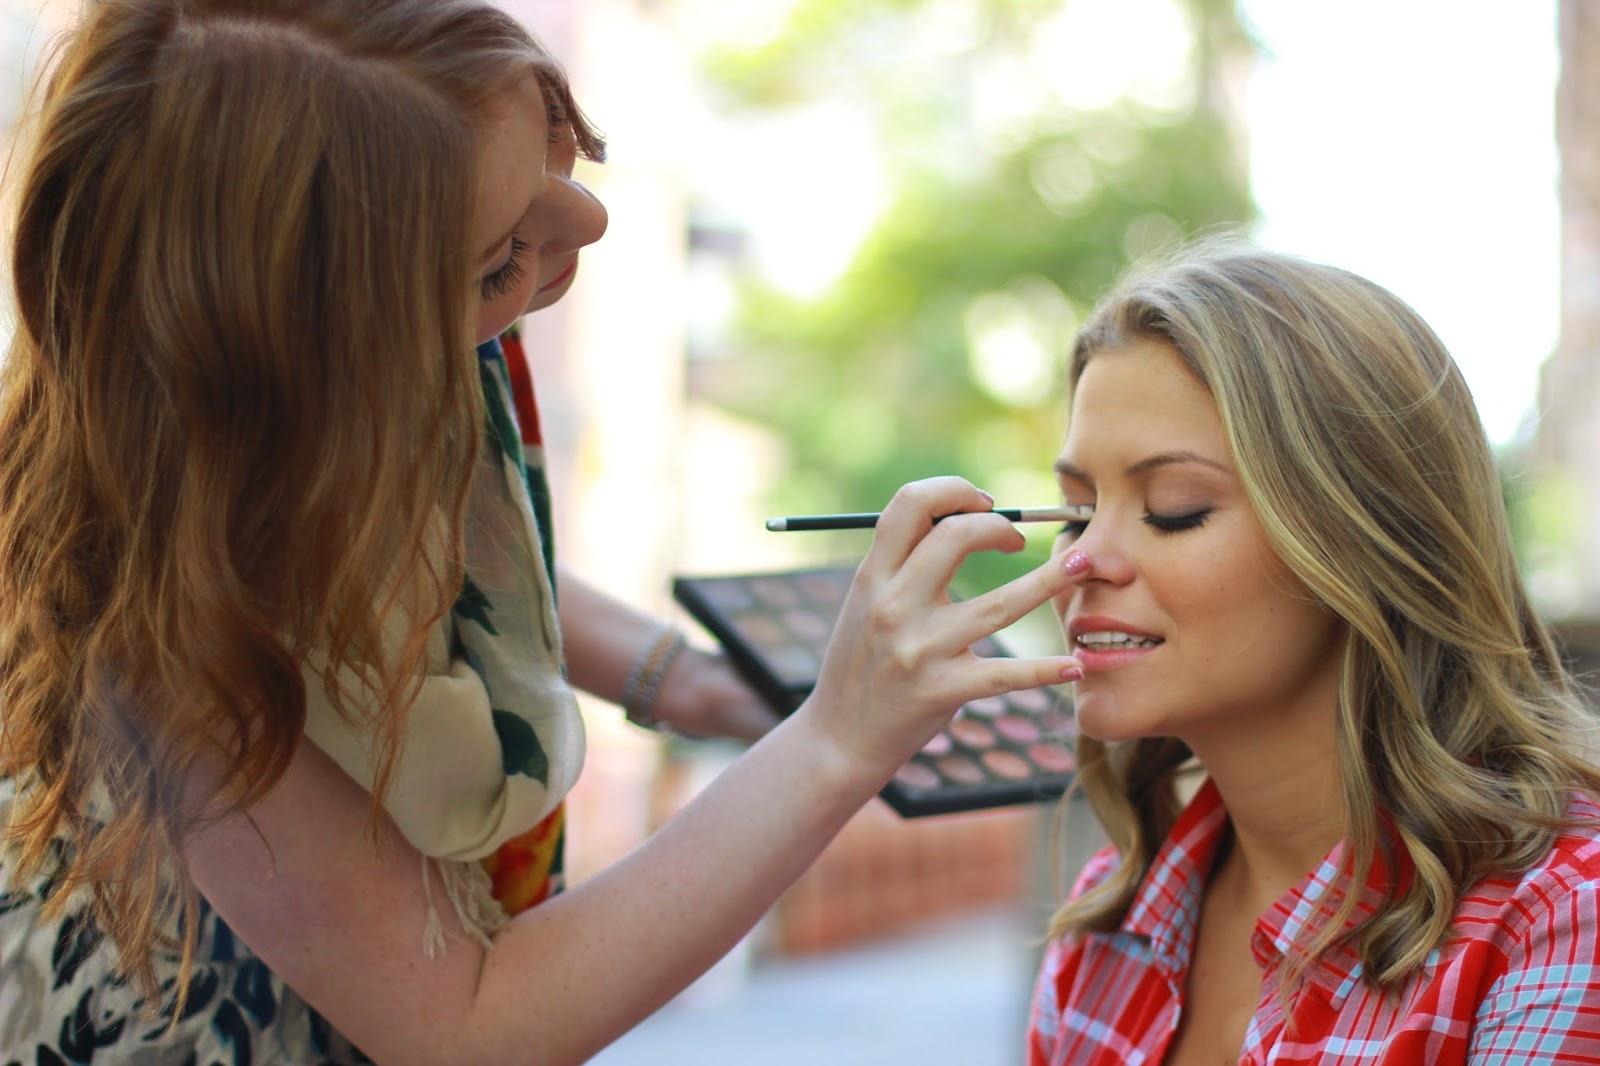 kapster salon kecantikan beauty clinic message pijat therapist layanan treatment memuaskan plus wanita cewek